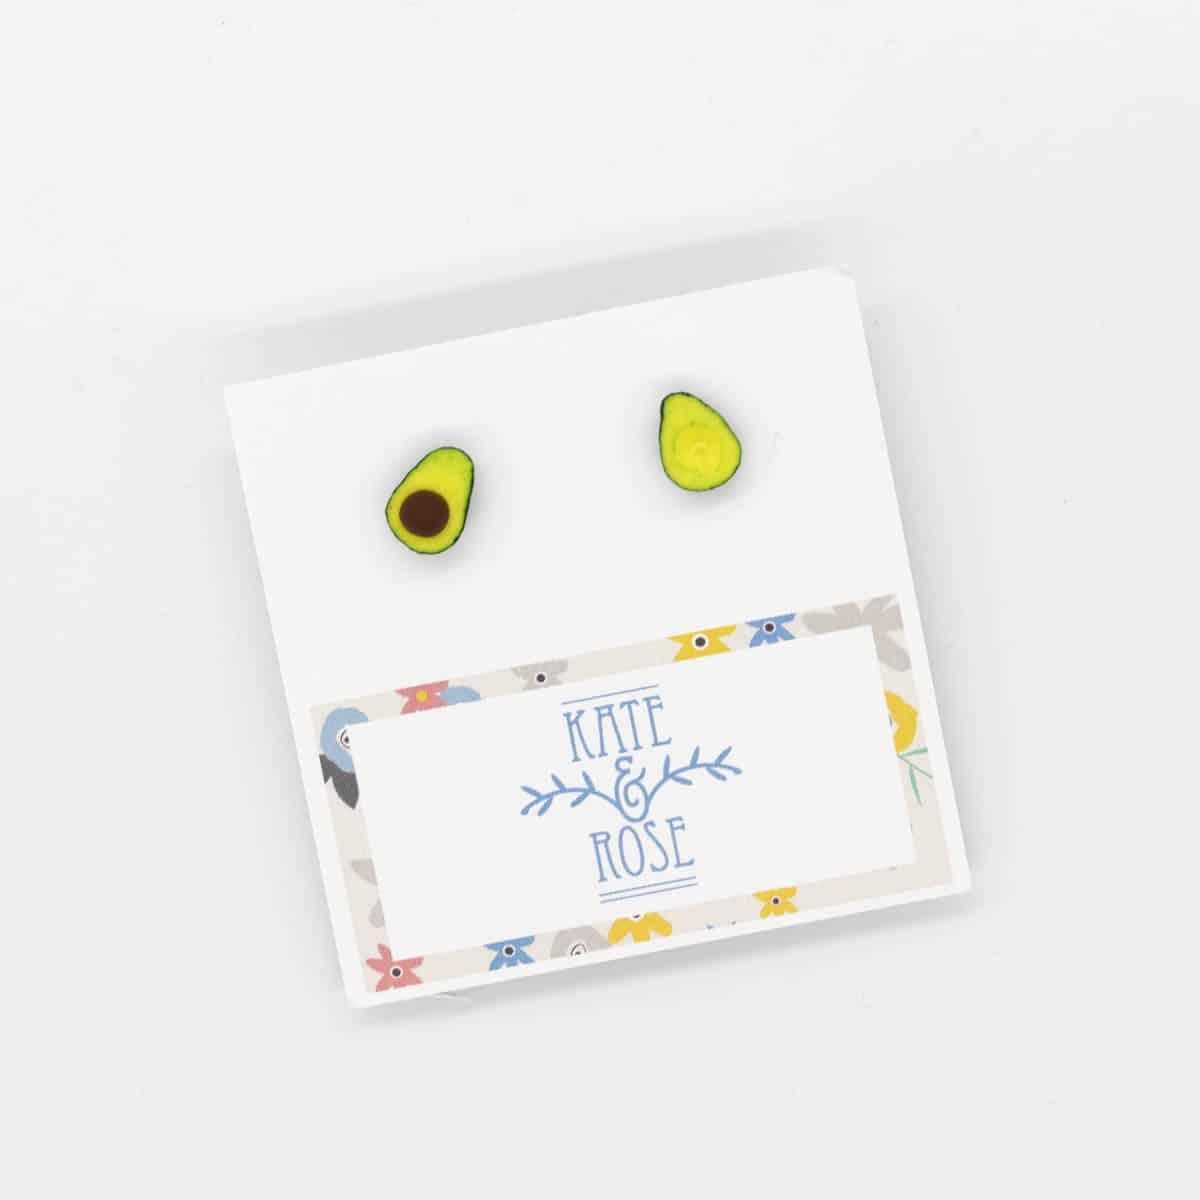 Avocado Half Earrings By Kate And Rose